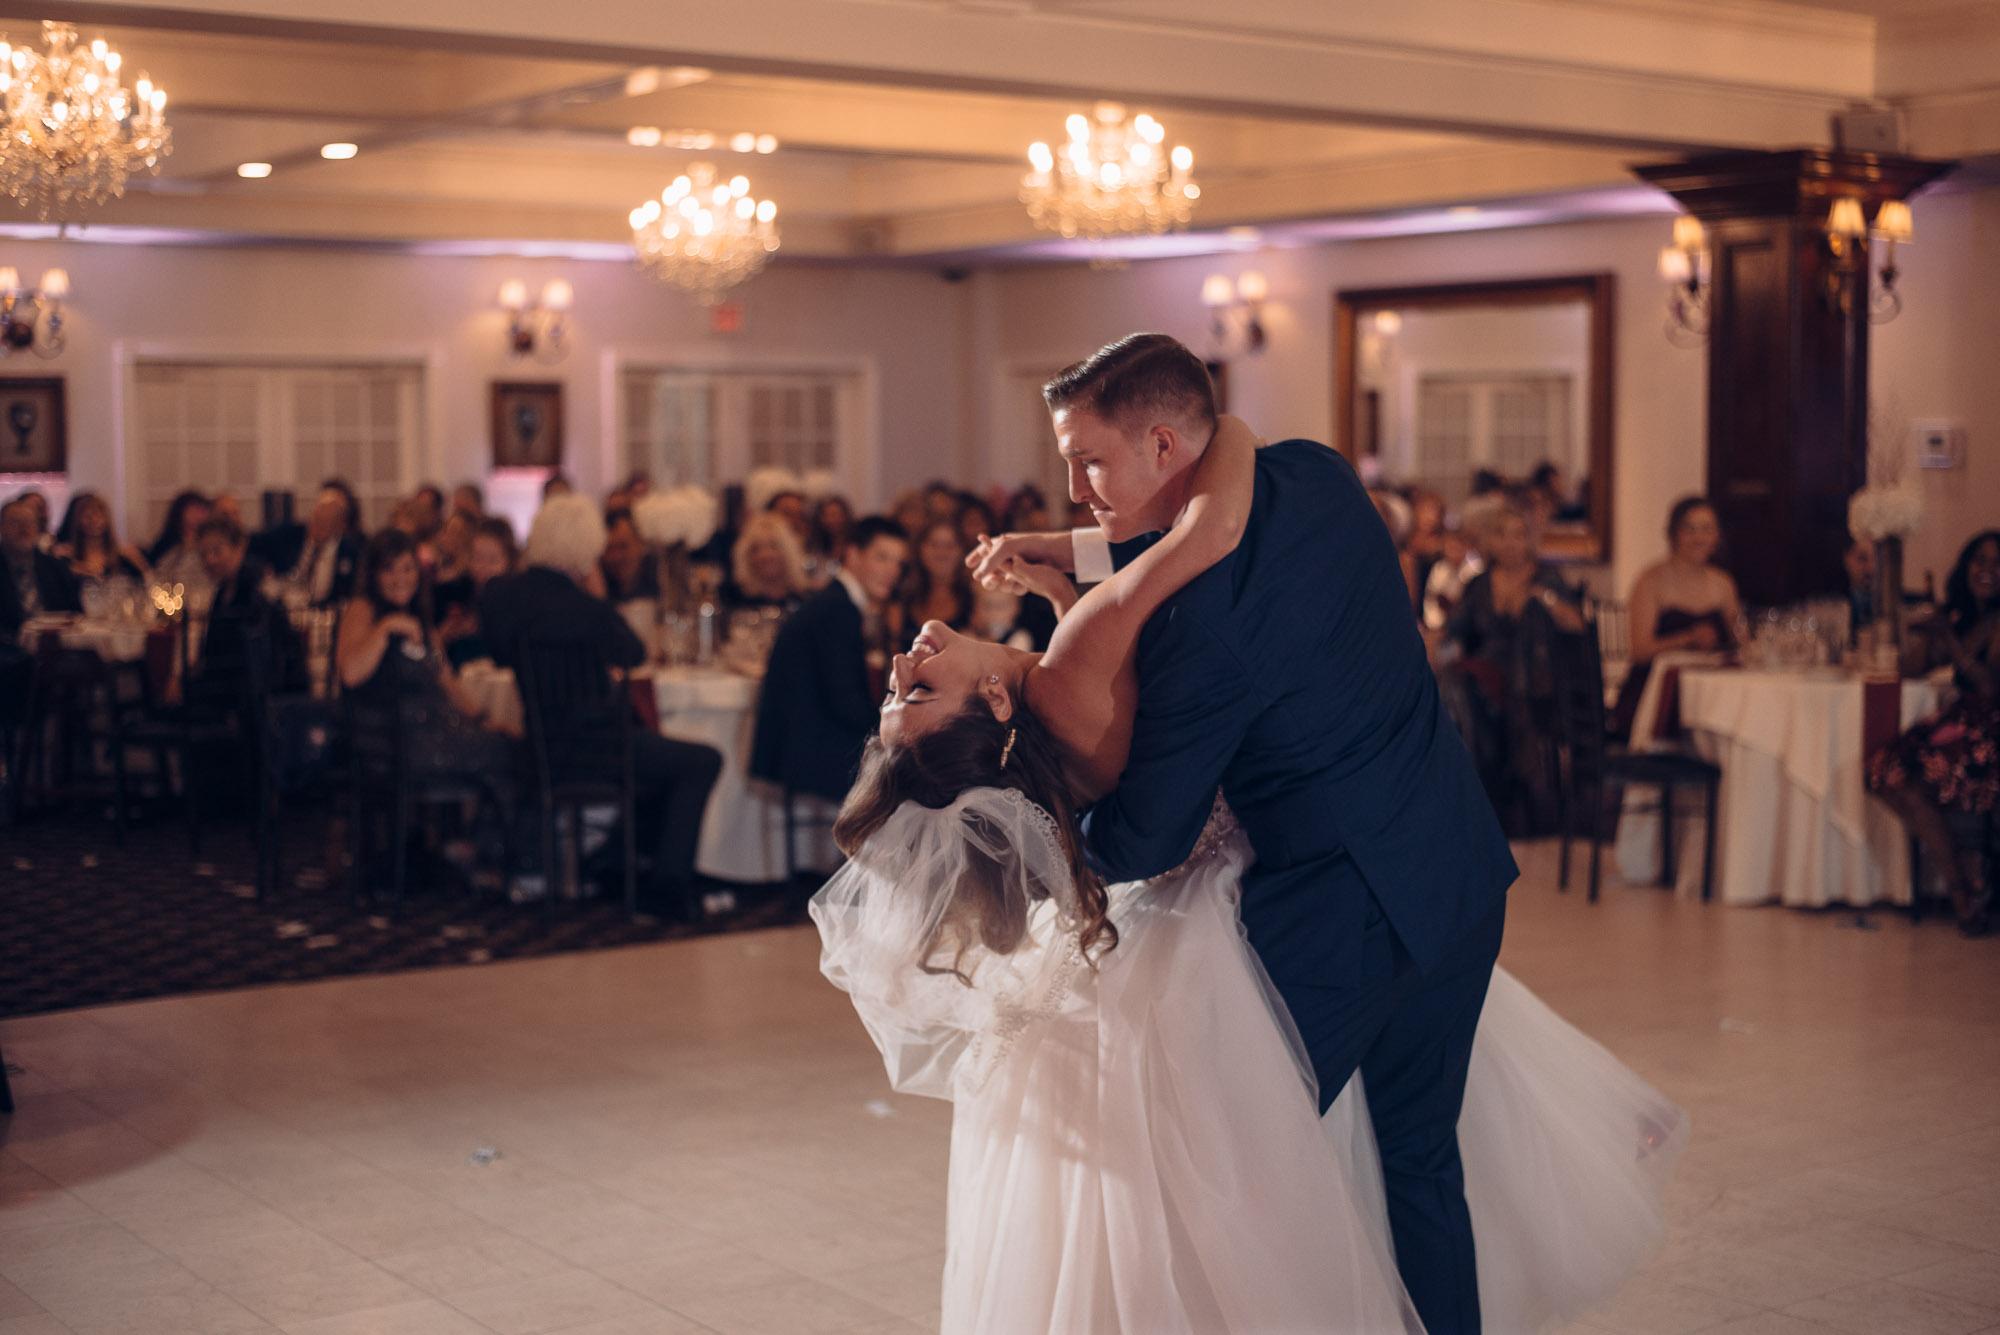 woodwinds_wedding_171020_web-50.jpg